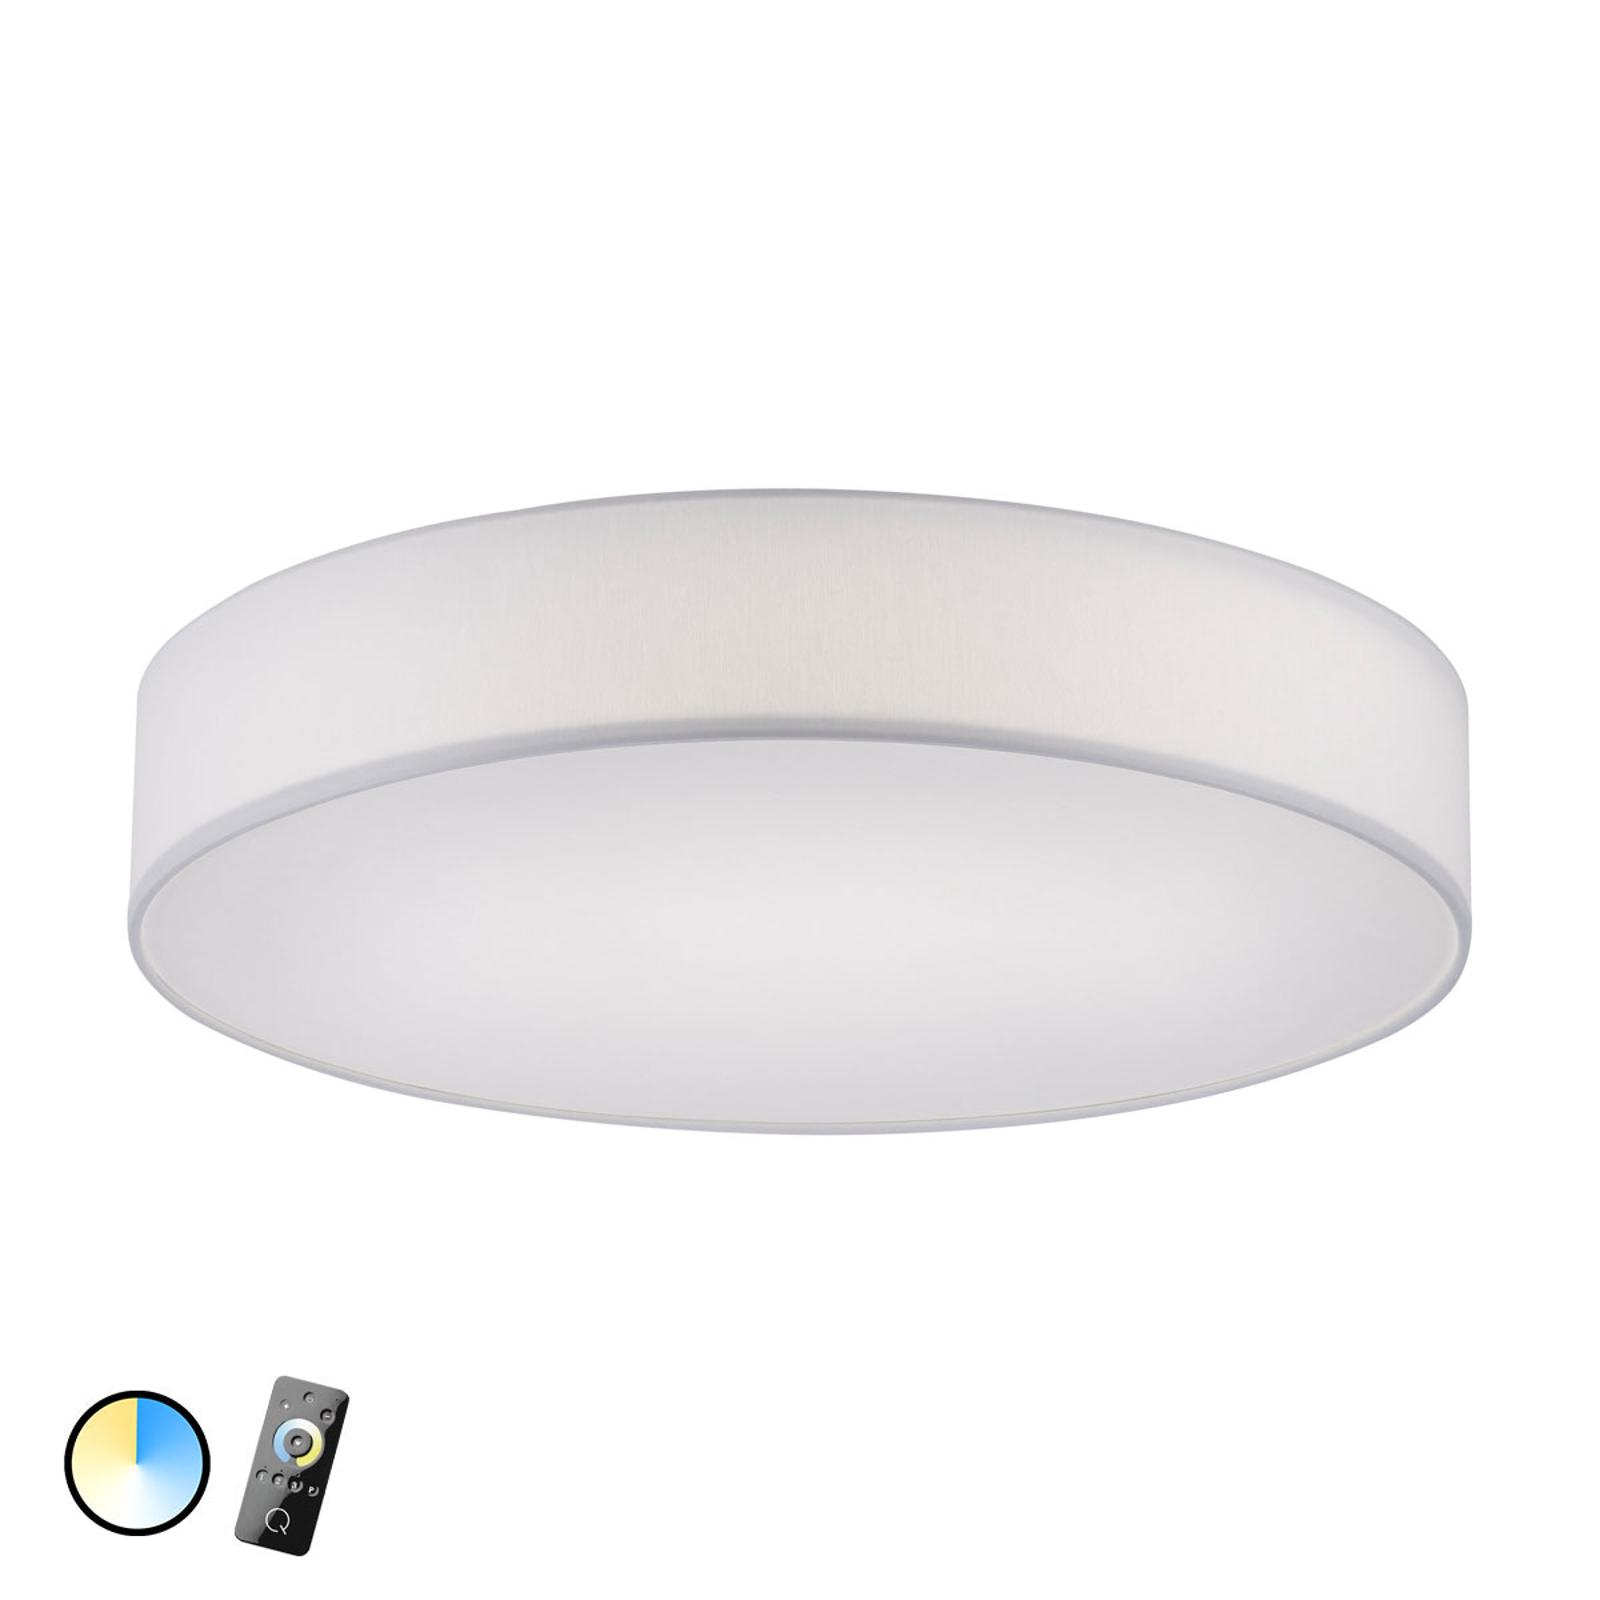 Sterowana tekstylna lampa sufitowa Q-Kiara – biała